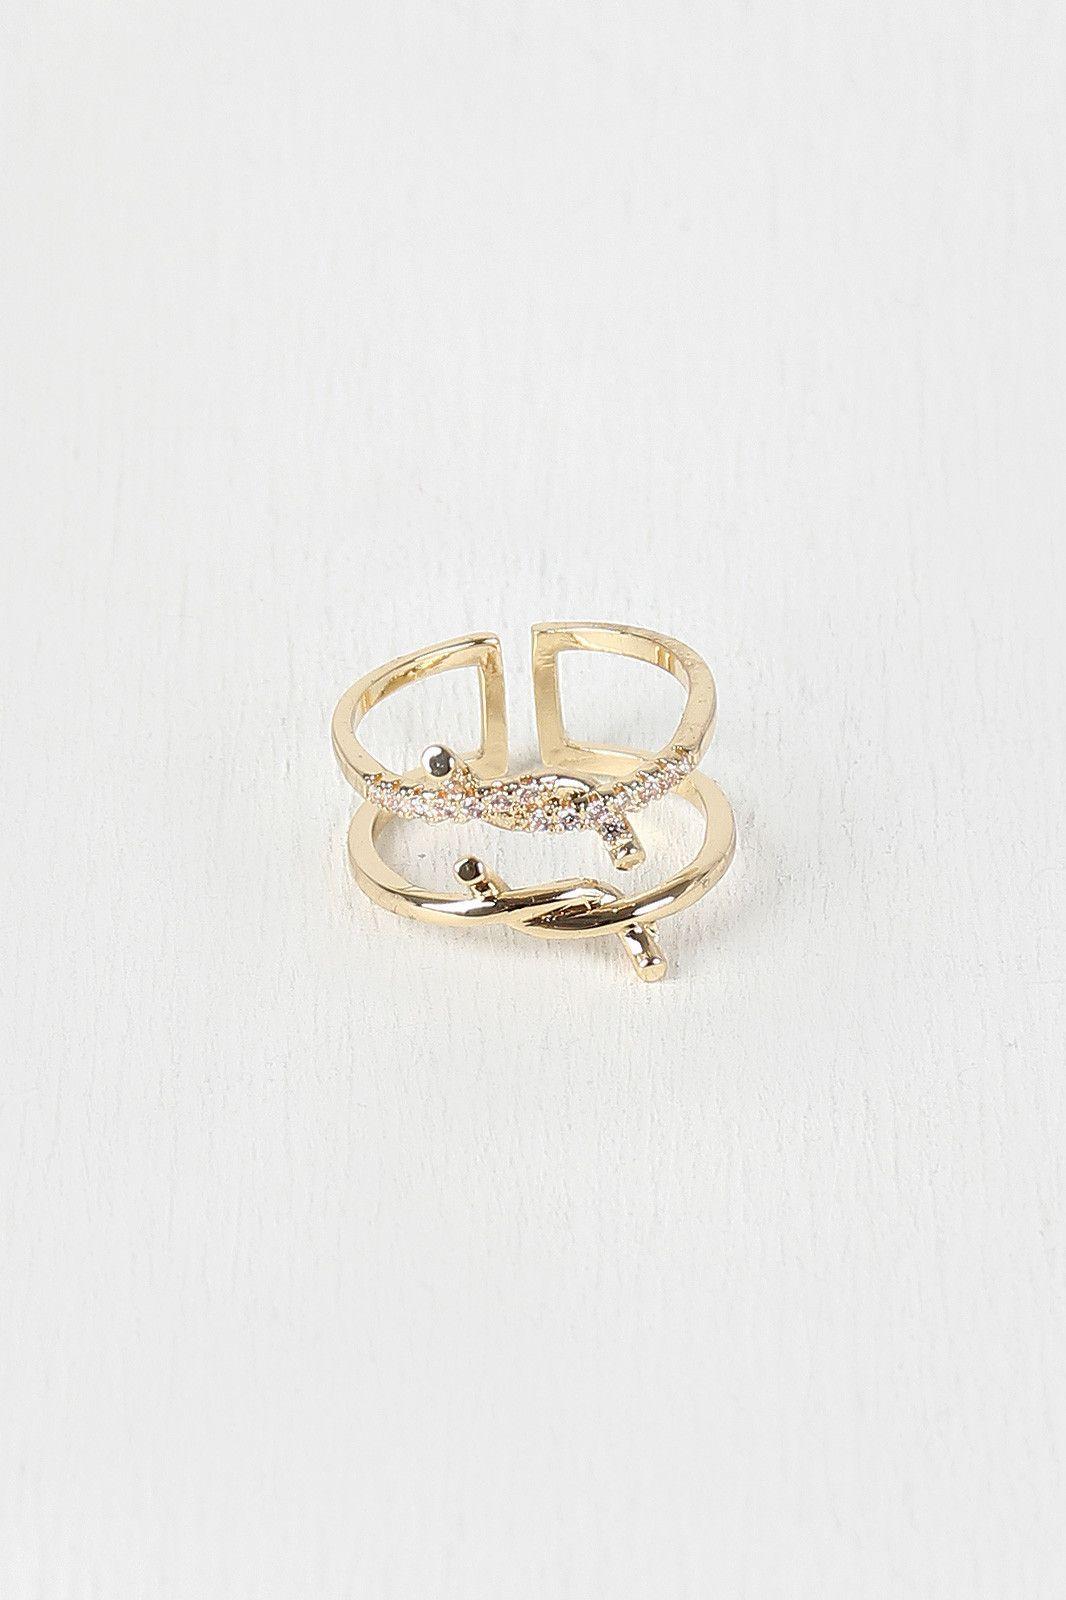 Rhinestone Double Twisted Ring